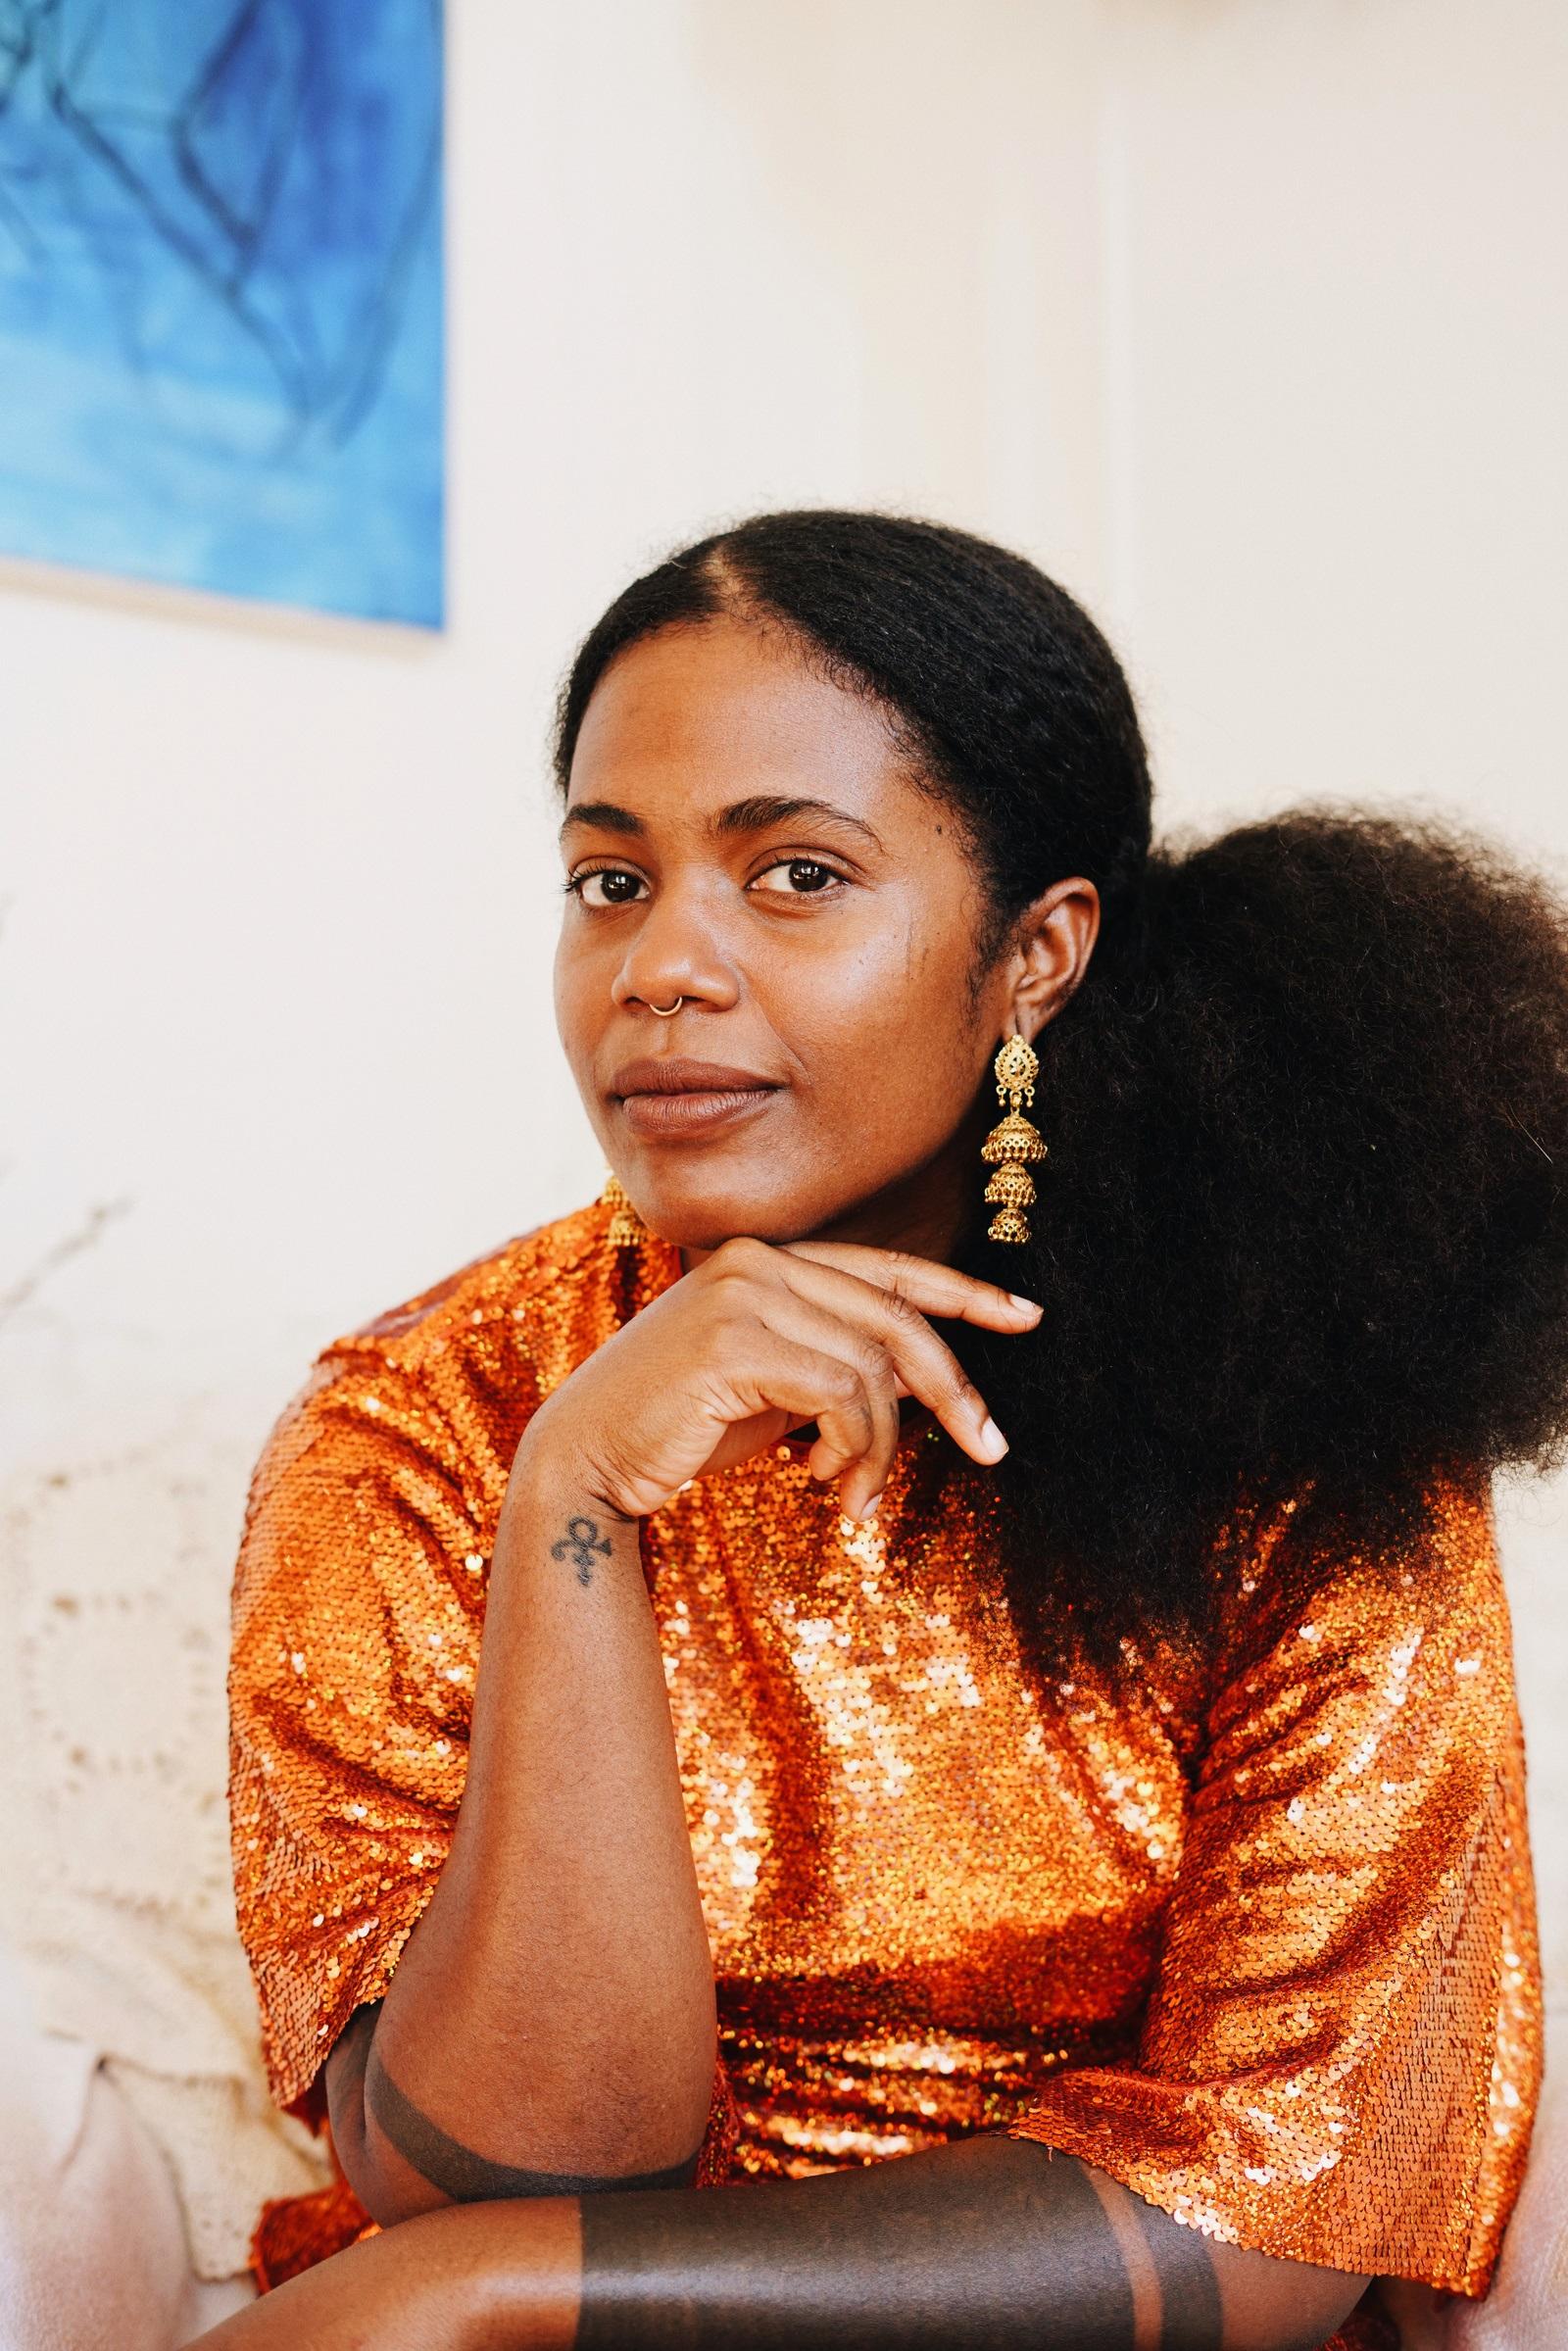 L'escriptora nigeriana, igbo-tamil, Akwaeke Emezi